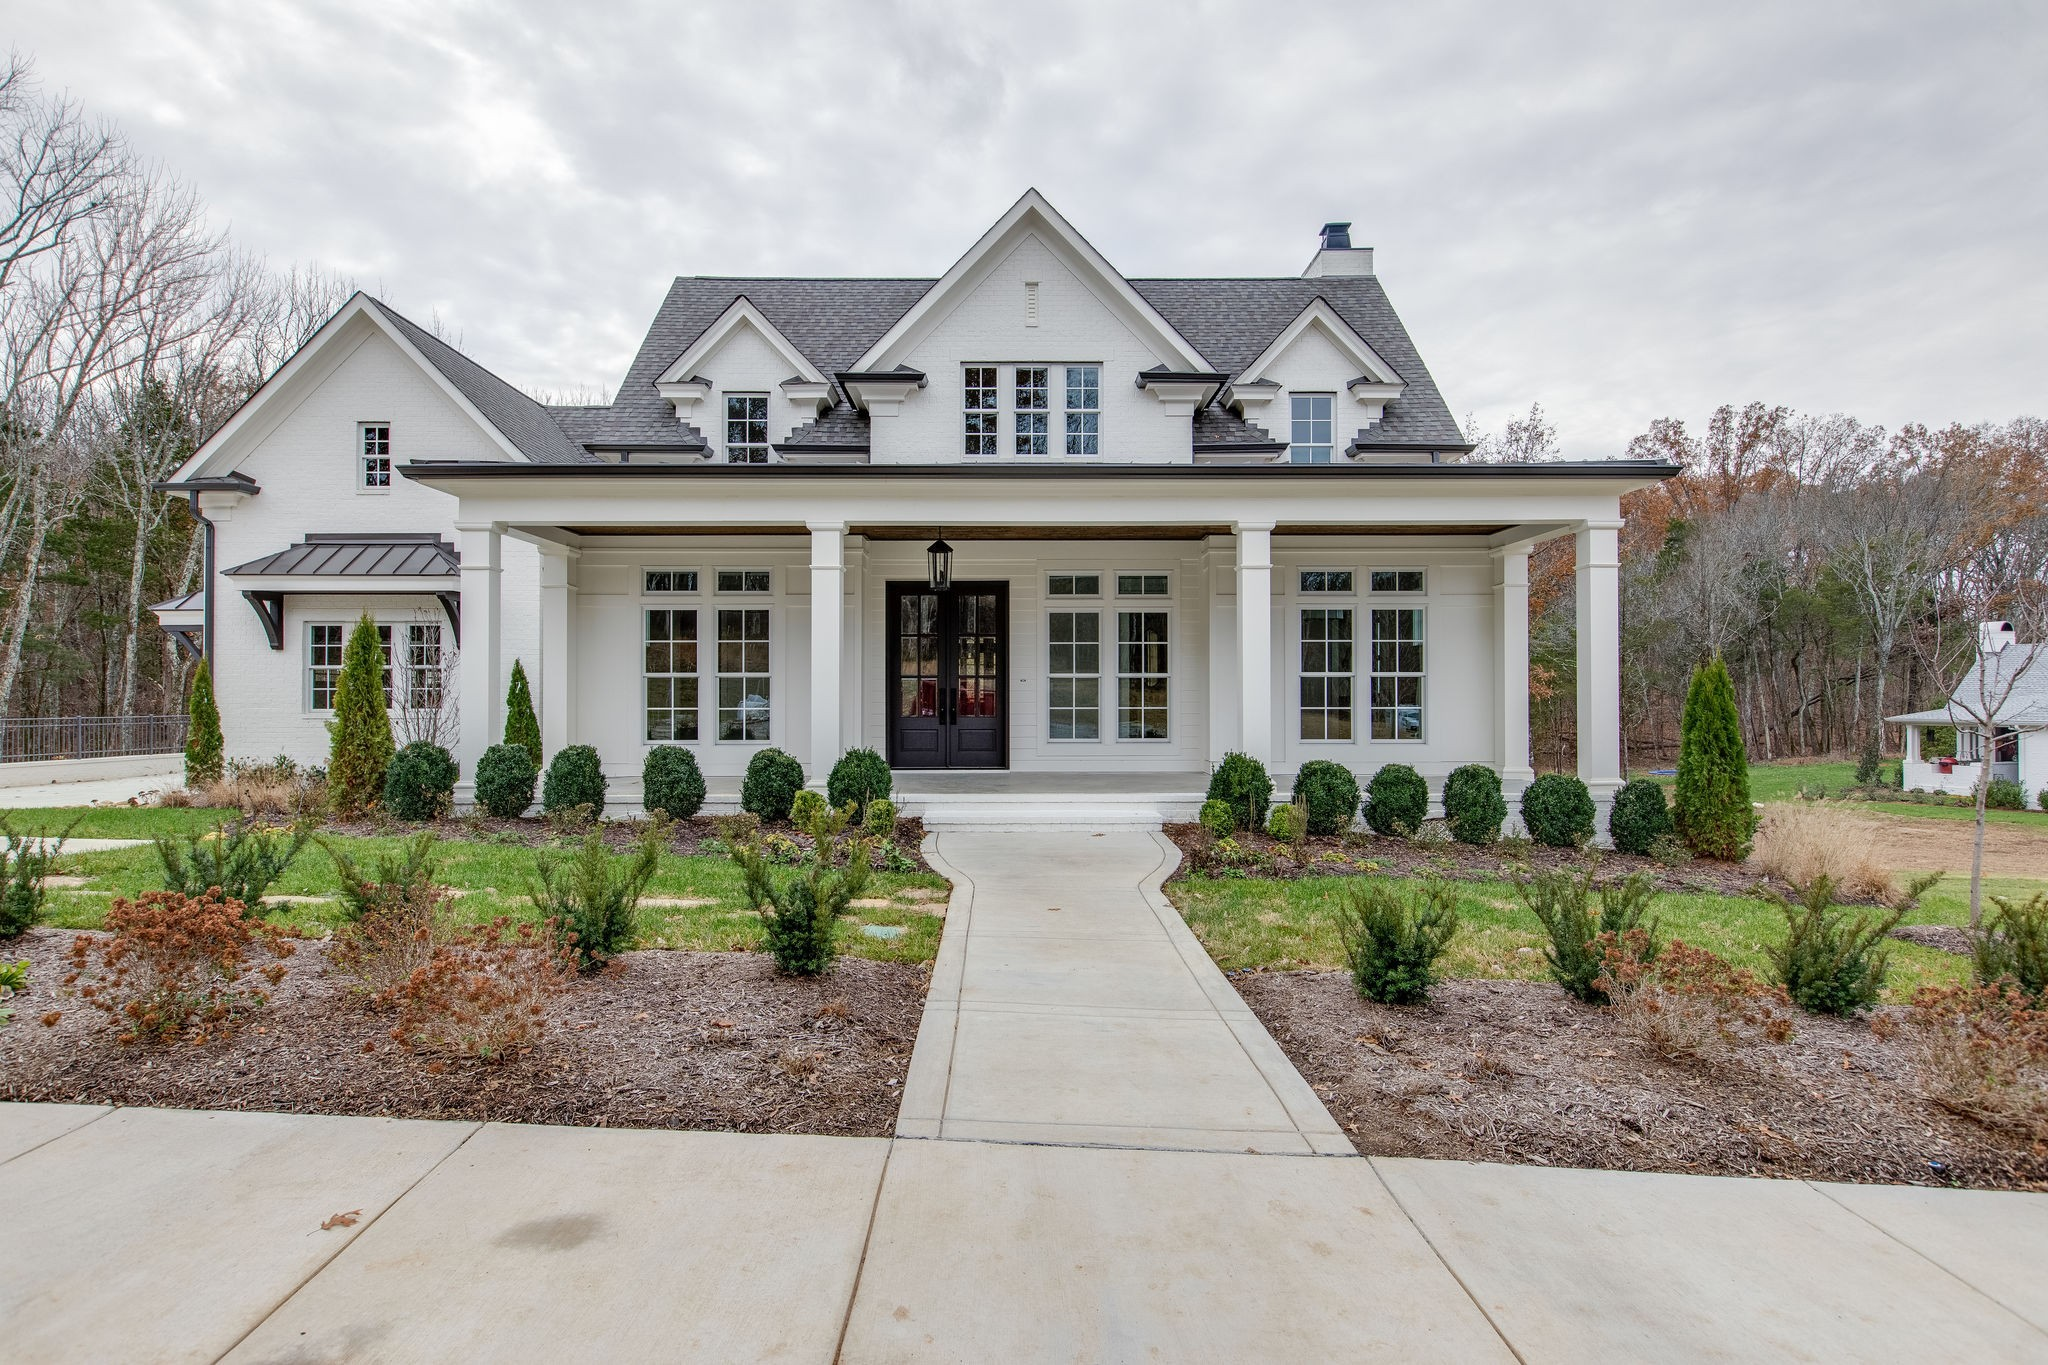 8629 Belladonna Dr (Lot 7031) Property Photo - College Grove, TN real estate listing